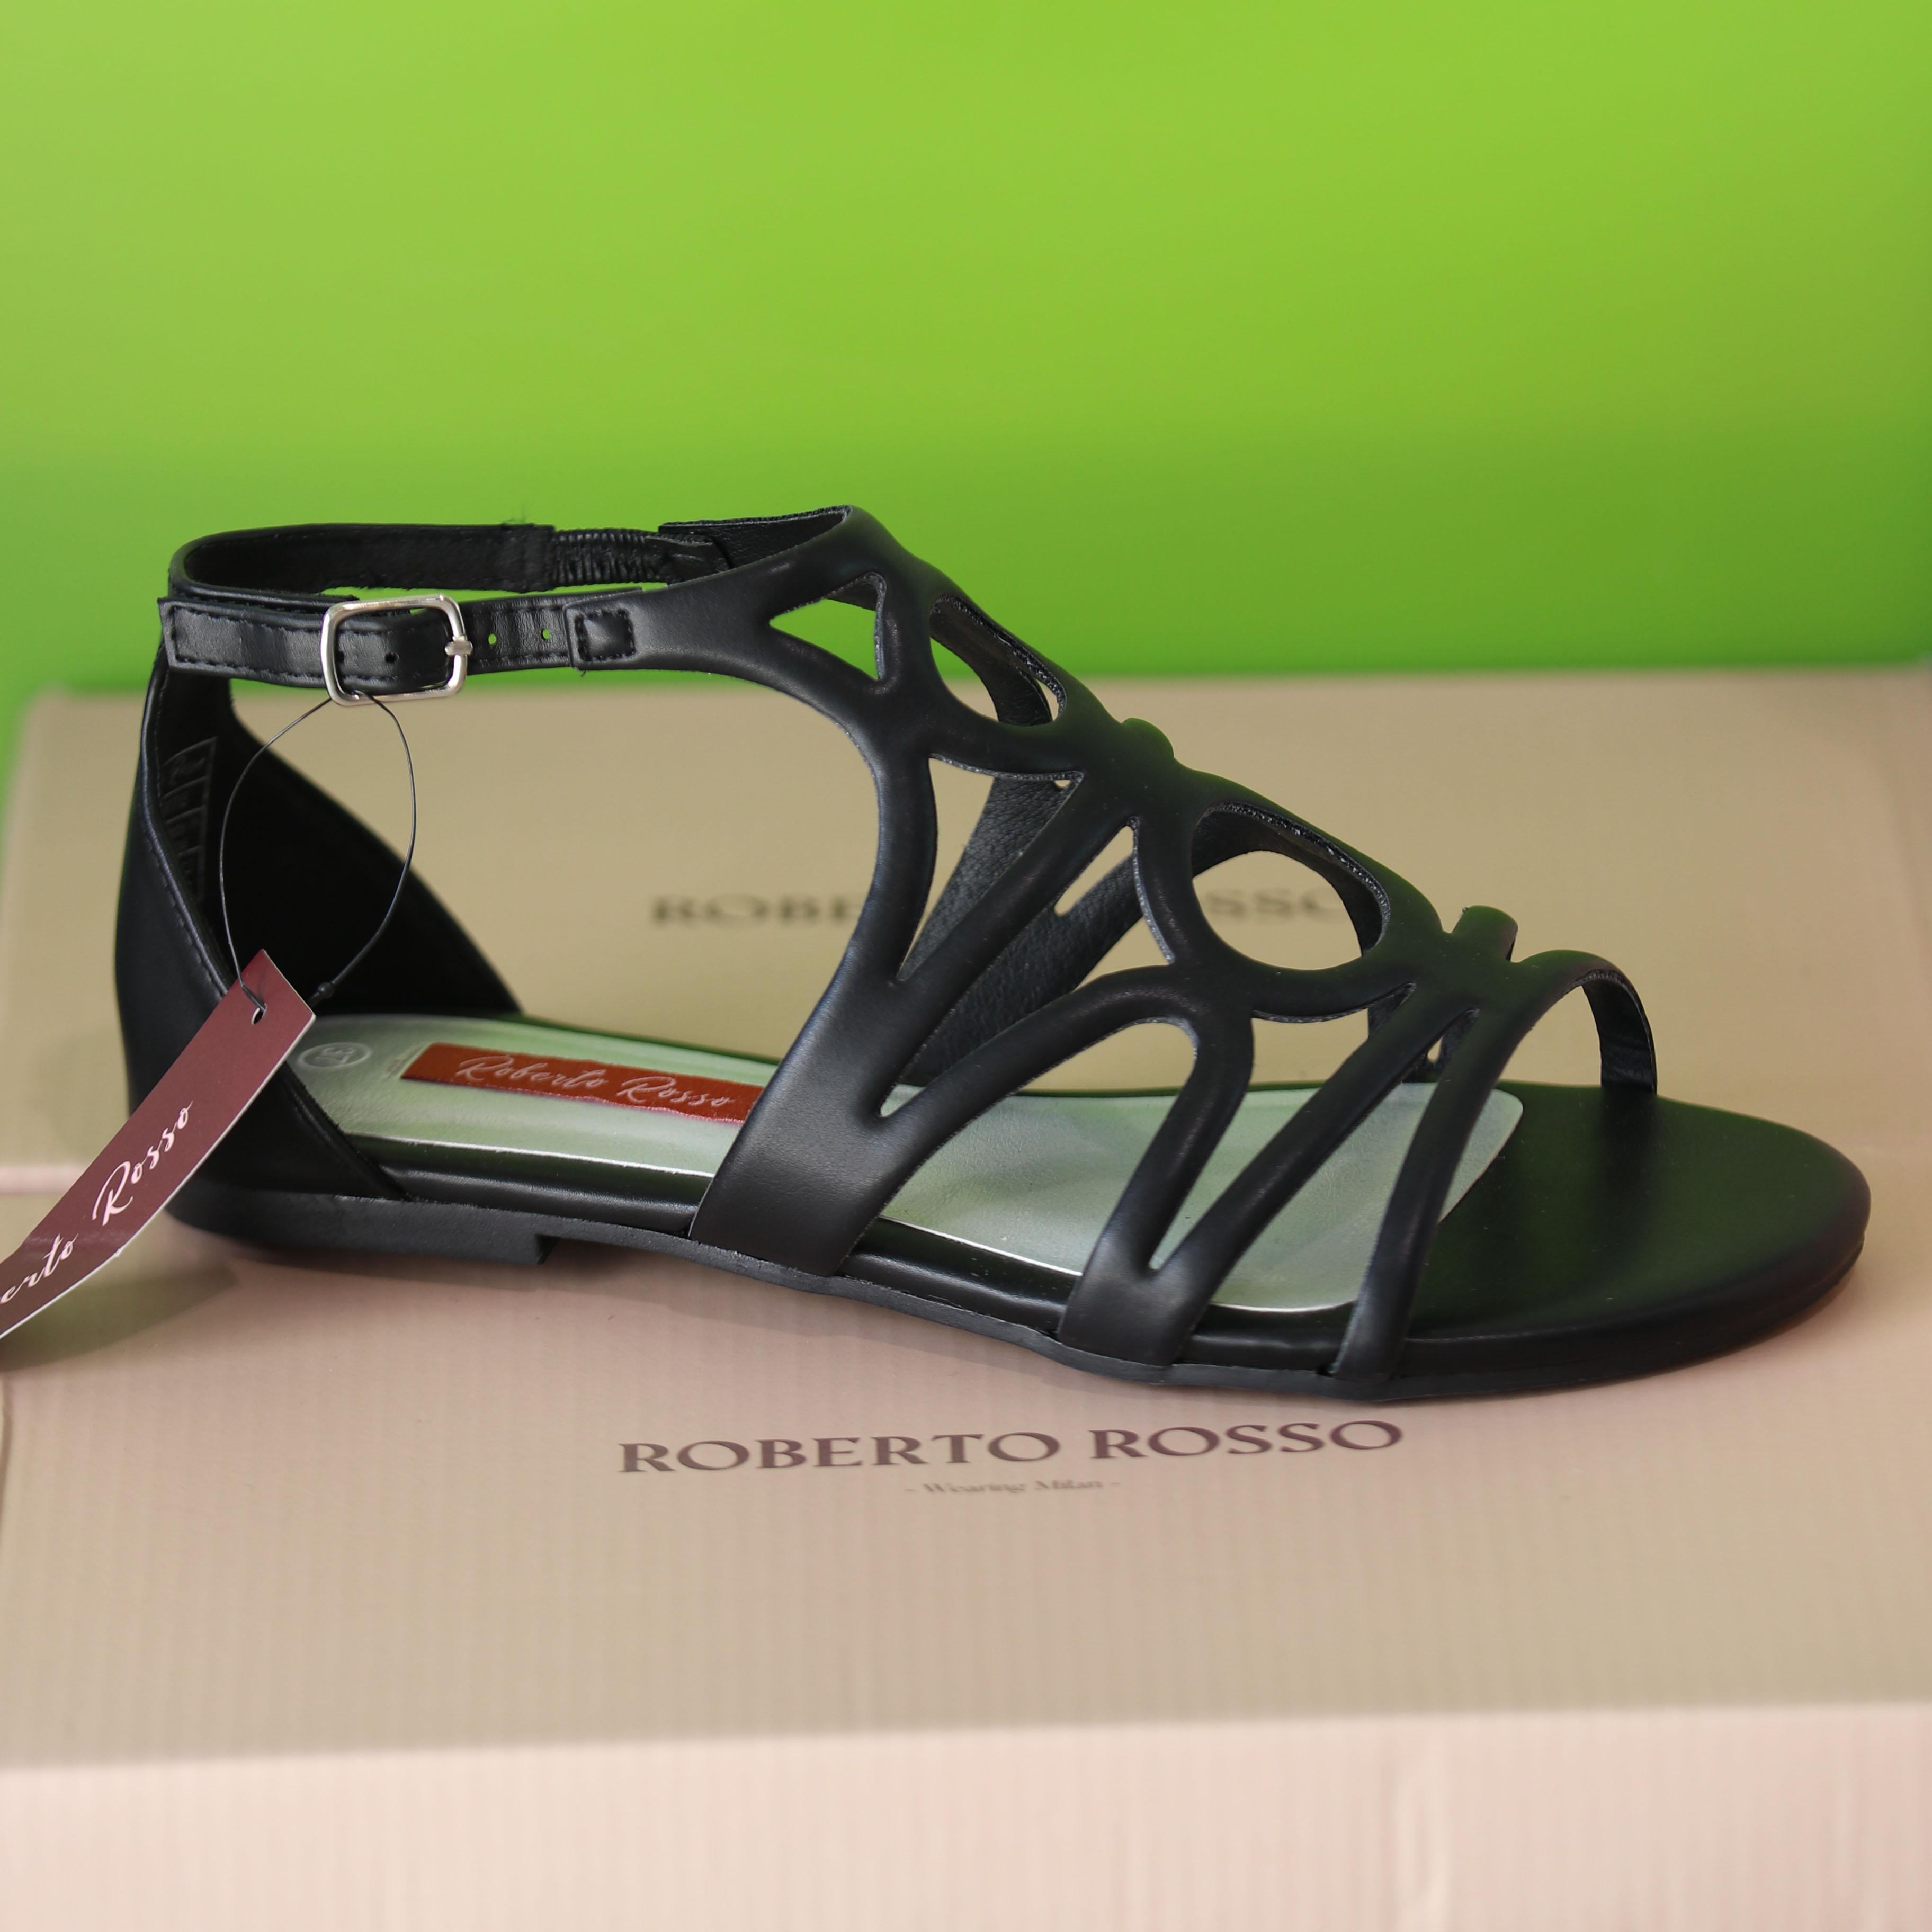 roberto rosso – martis sort sandal dame4